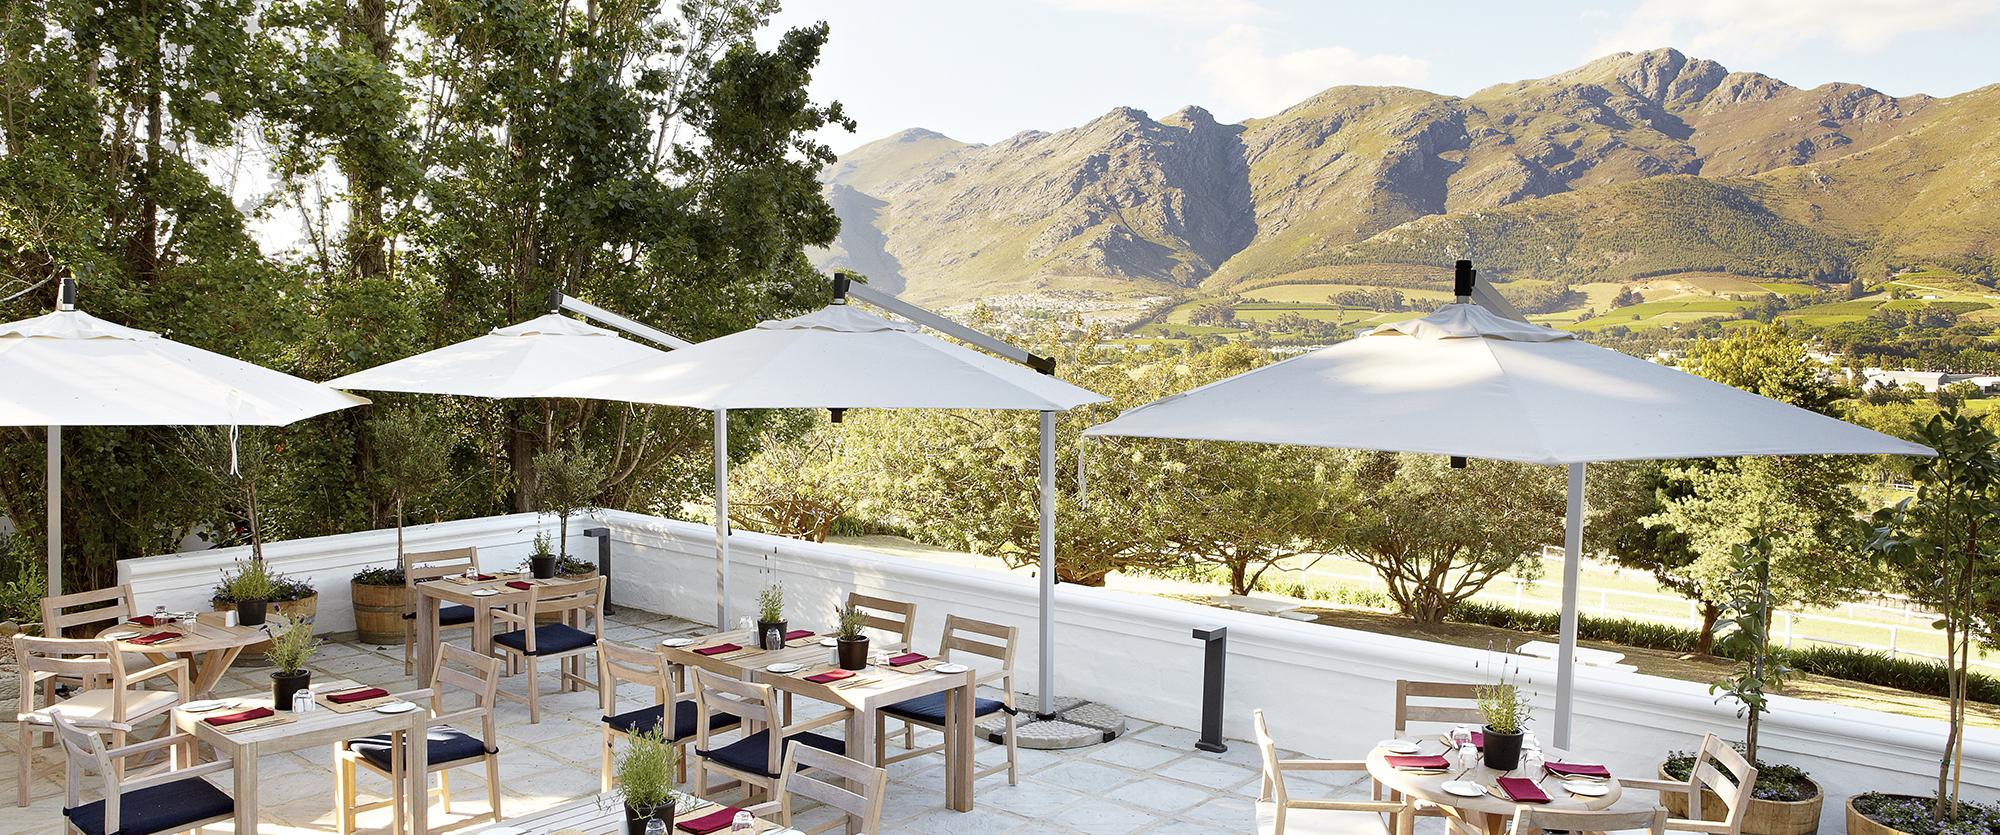 mont-rochelle-country-kitchen-terrace